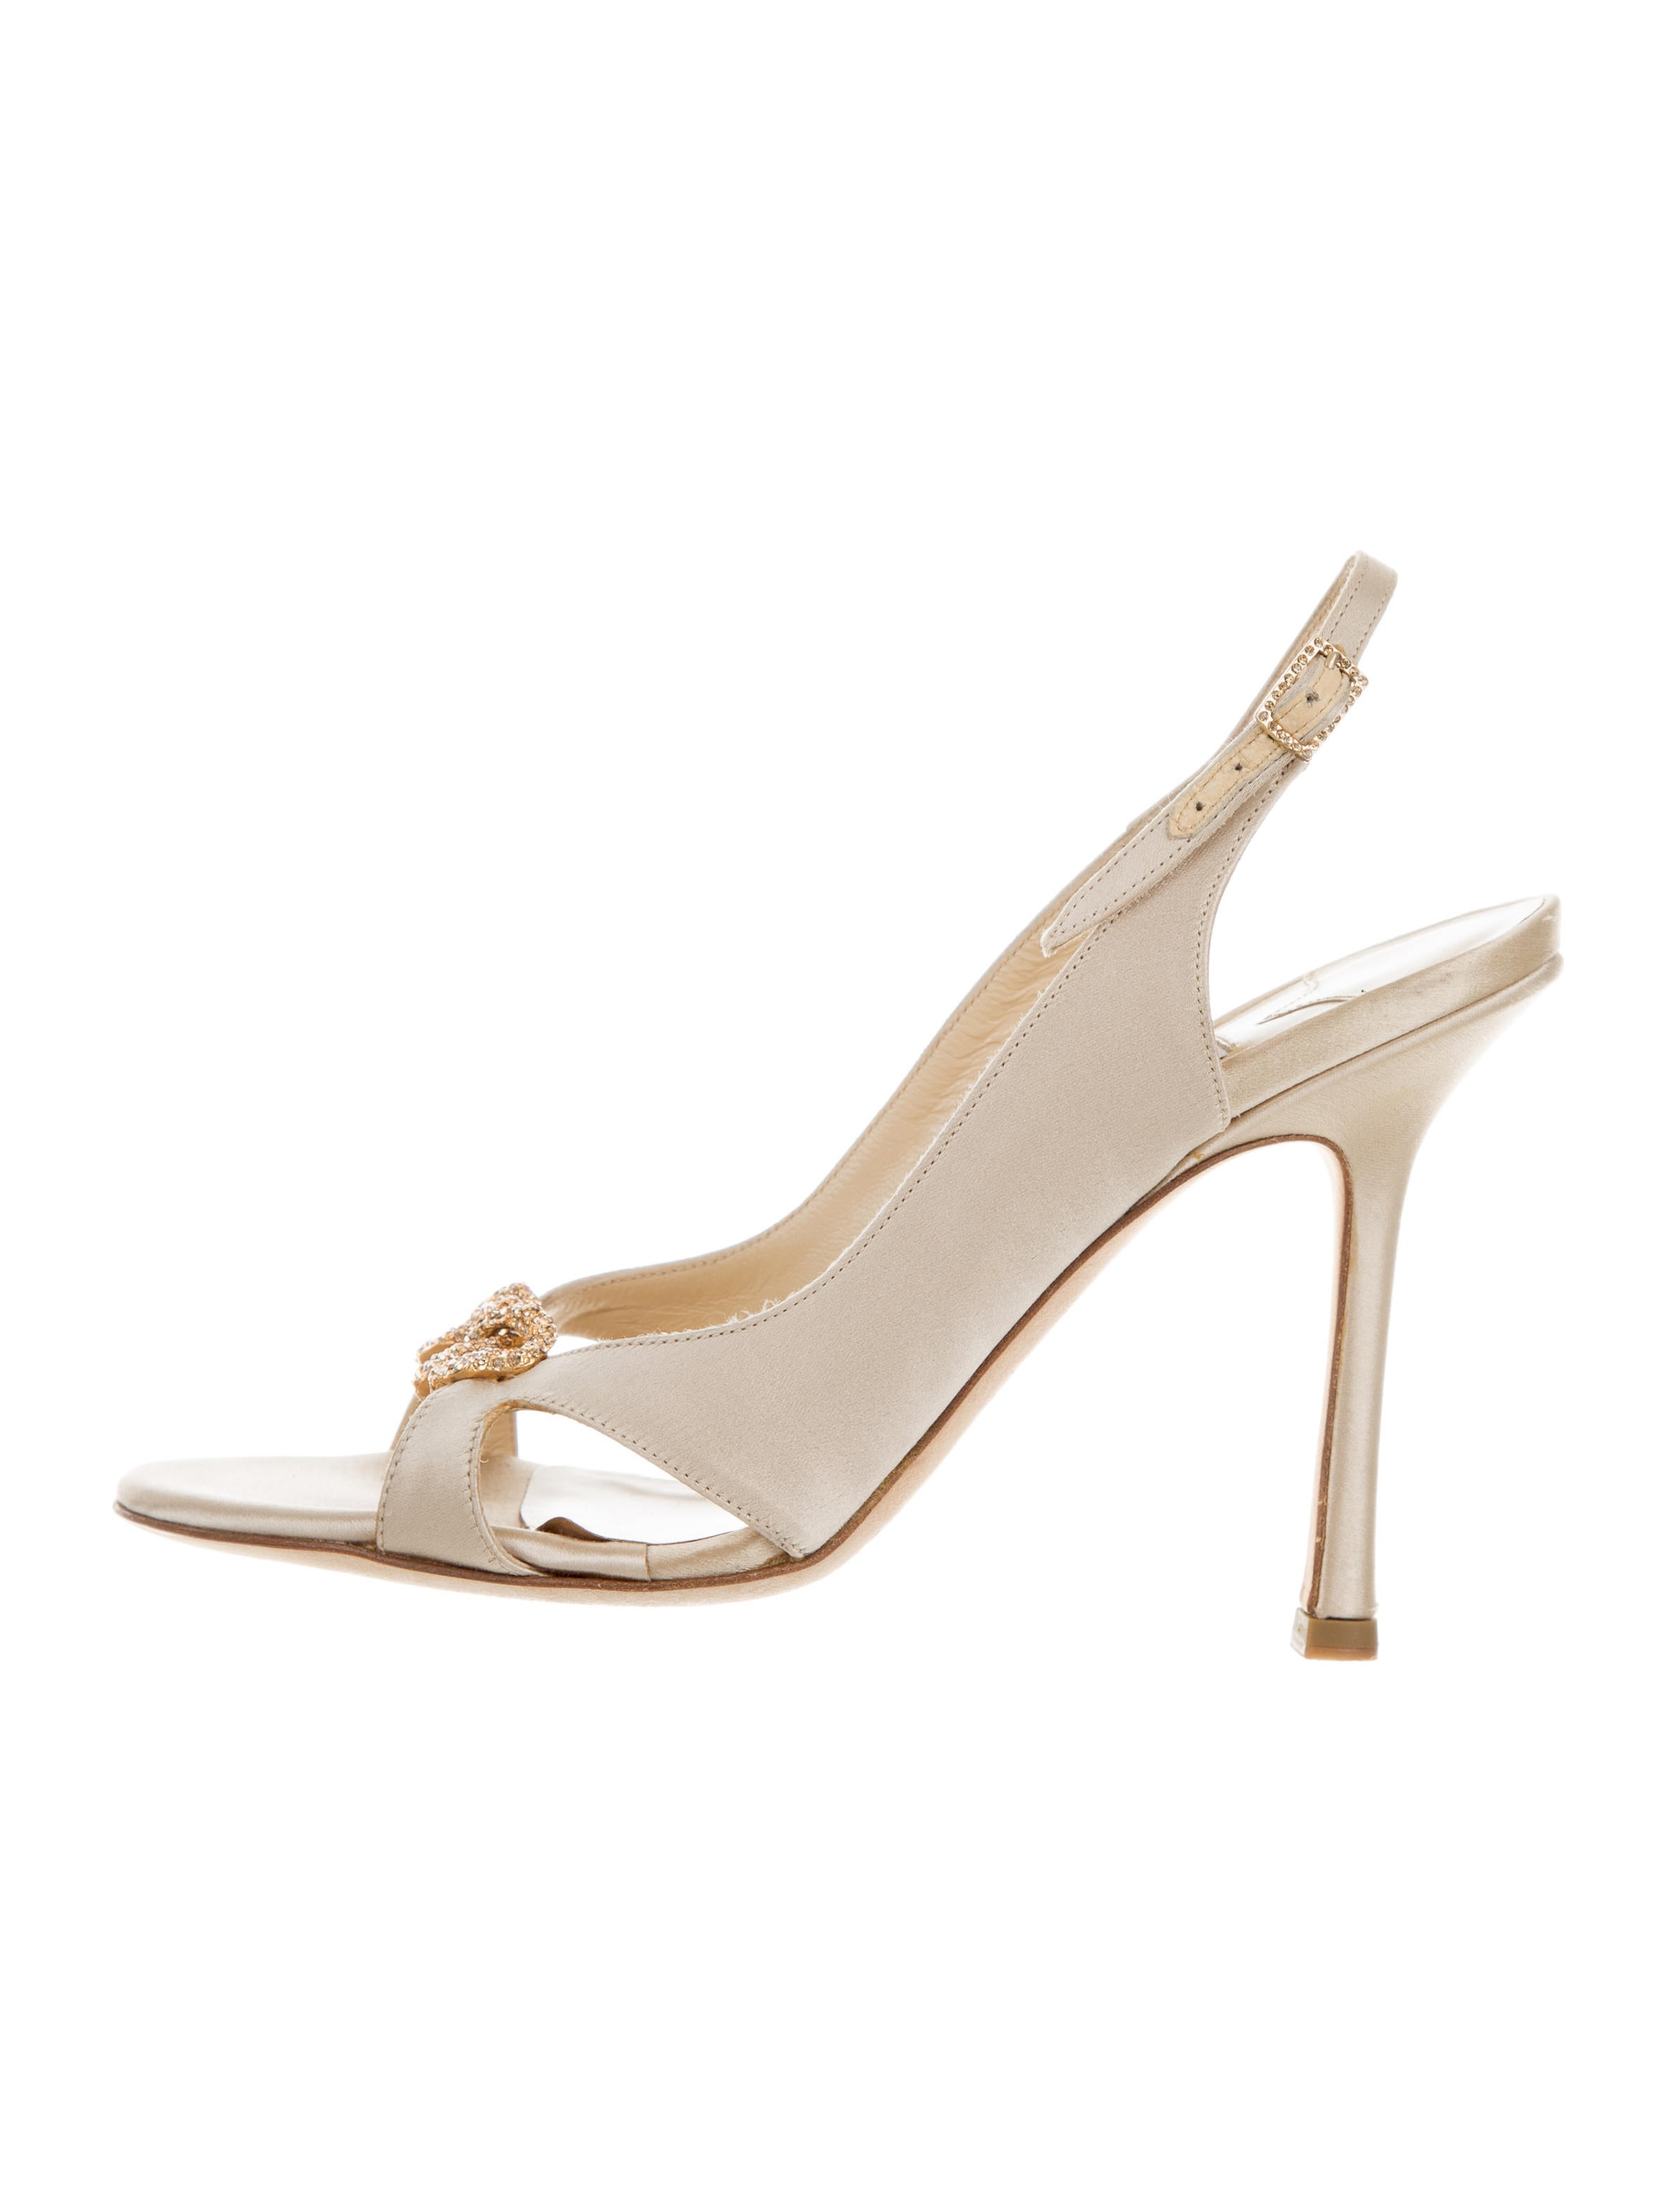 aa7a963e16a0c4 Jimmy Choo Embellished Satin Sandals - Shoes - JIM79103